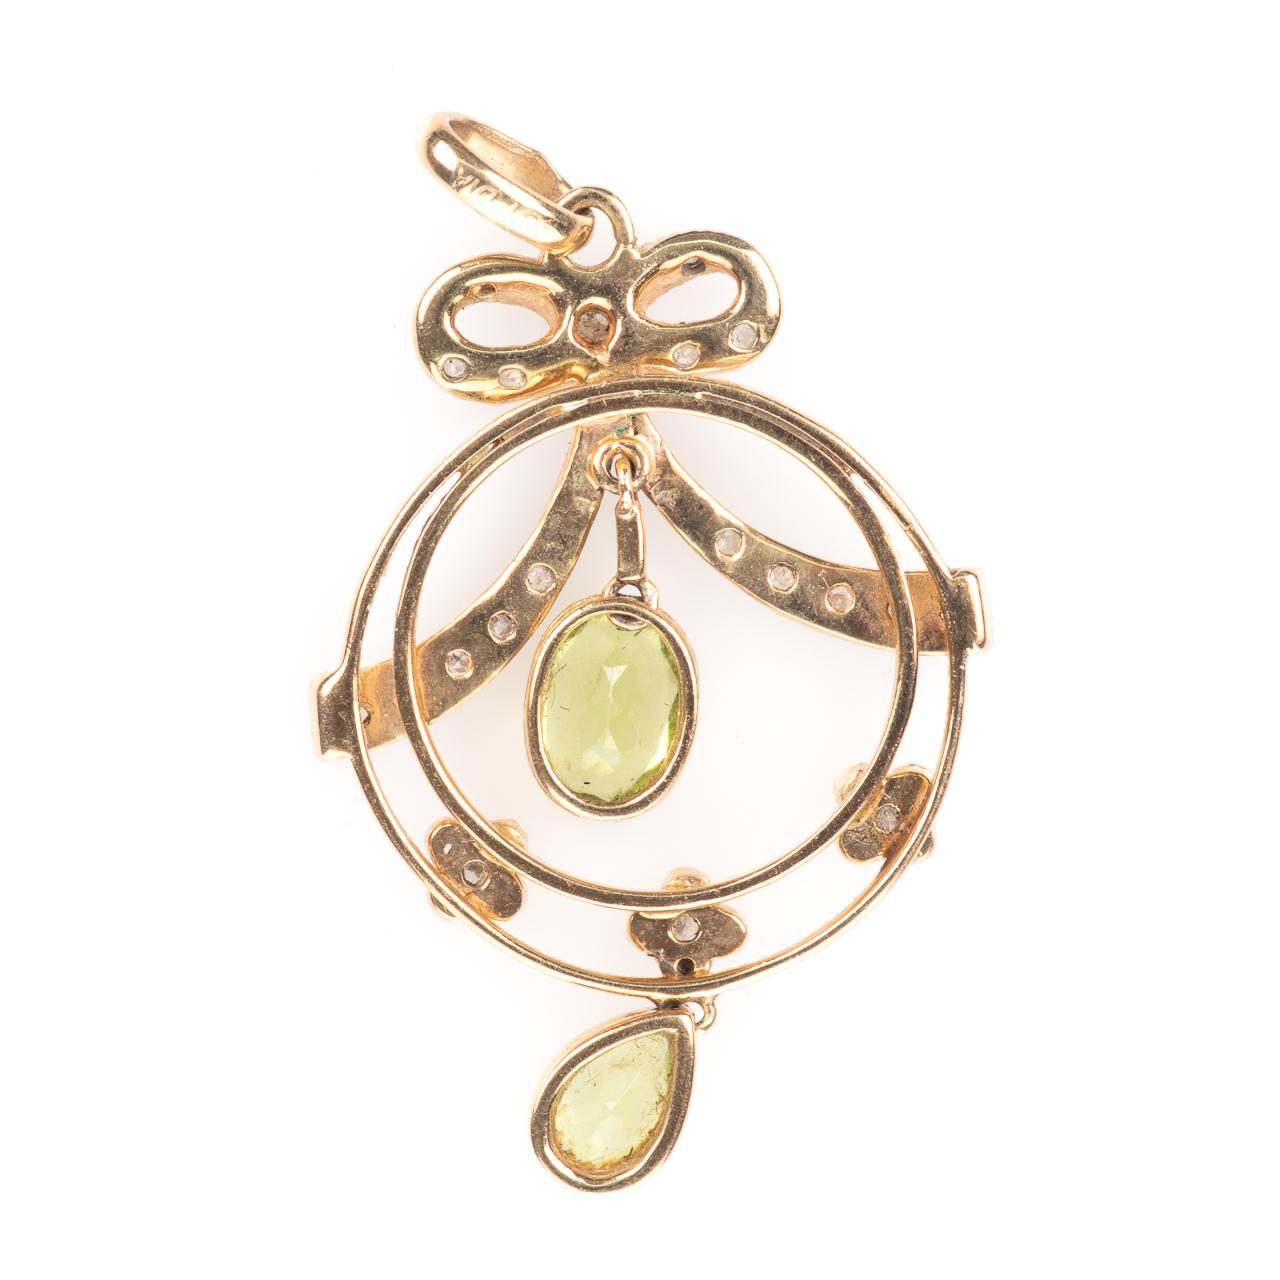 9ct Gold Art Nouveau Peridot & Diamond Pendant - Image 4 of 6